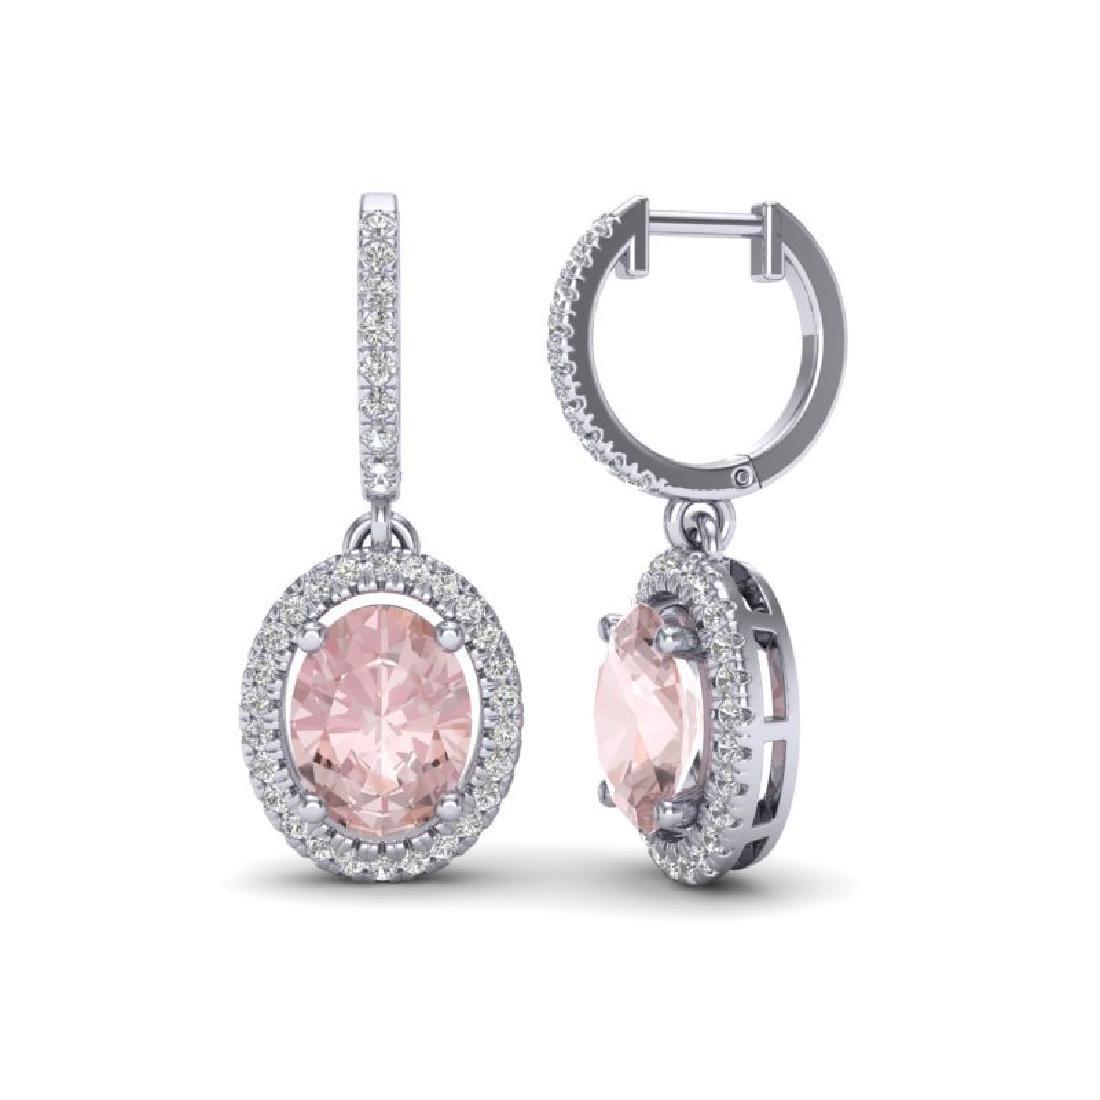 3.25 CTW Morganite & Micro Pave VS/SI Diamond Earrings - 2